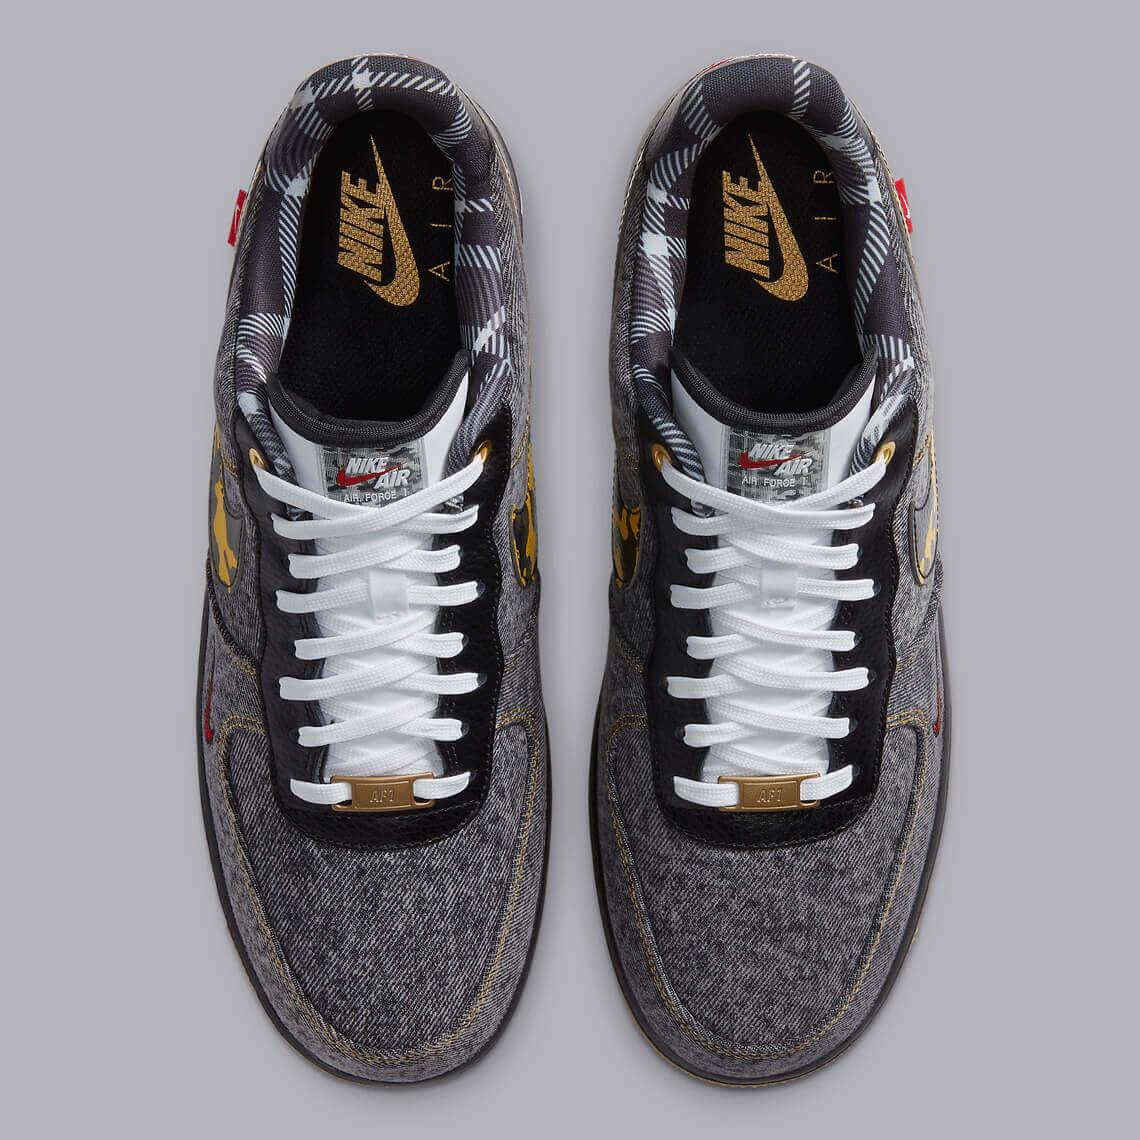 Nike Air Force 1 Remix Pack Denim DB1964 001 4